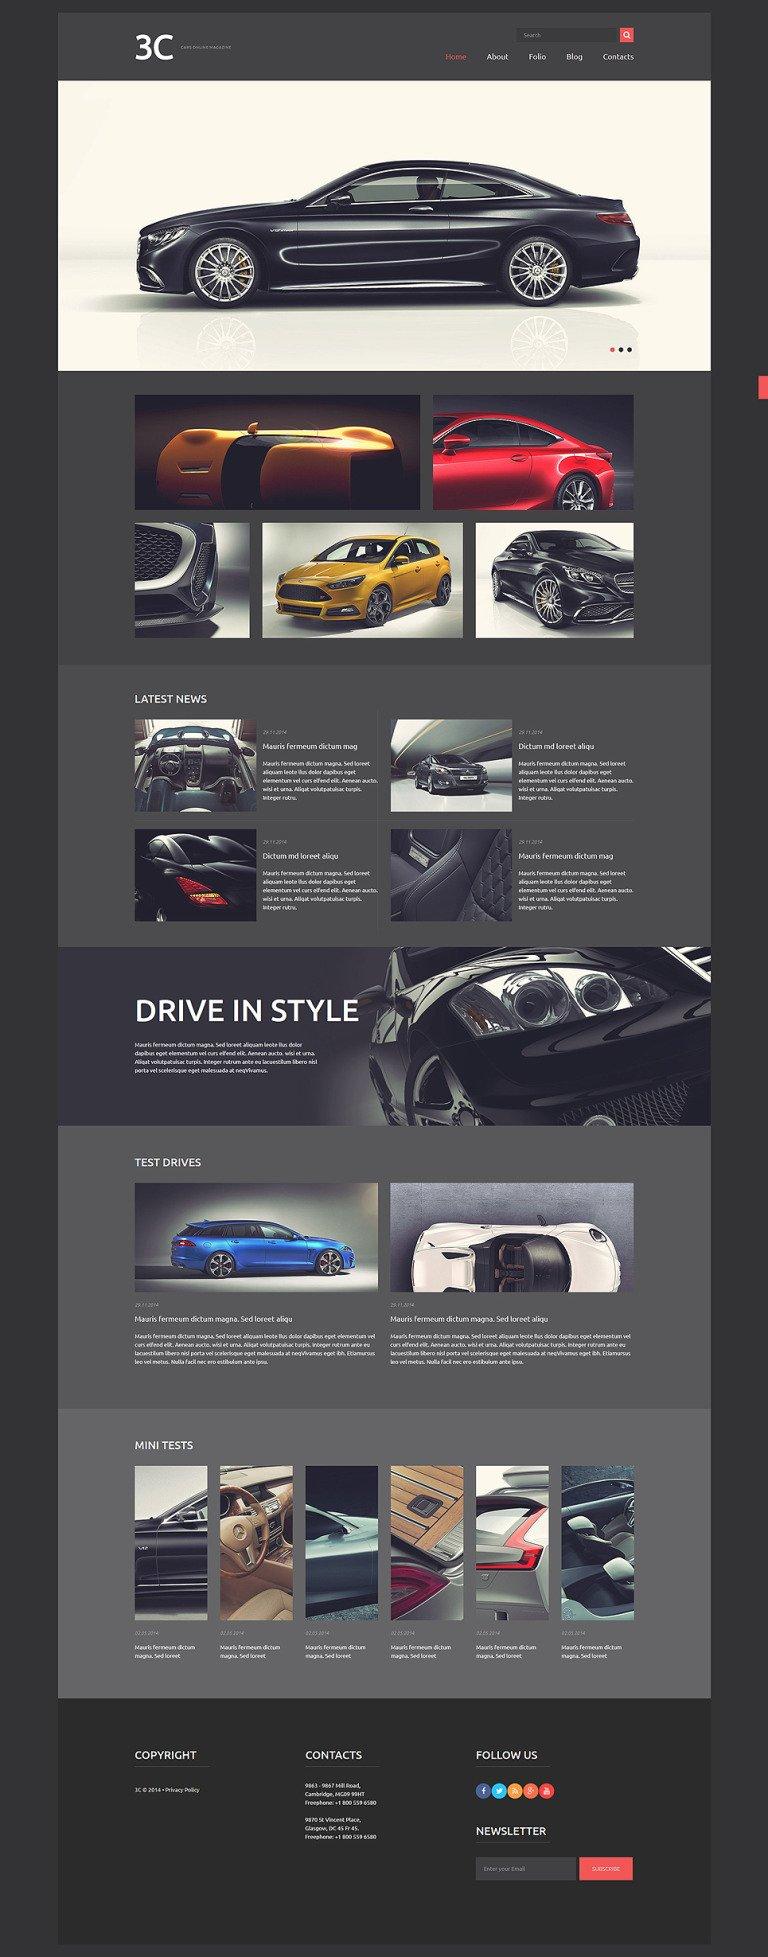 Auto Enthusiasts Club Joomla Template New Screenshots BIG